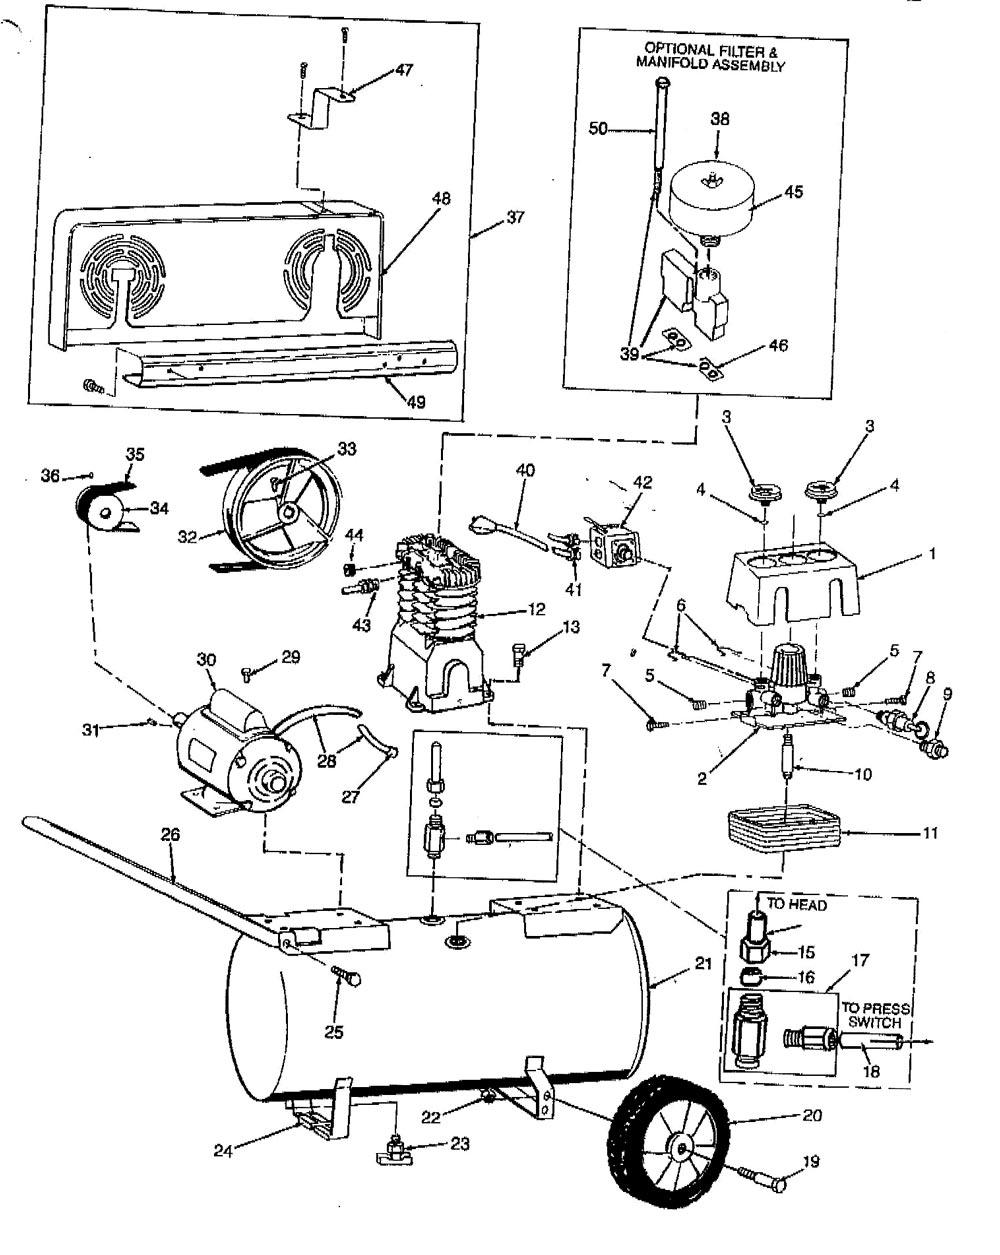 air pressor wiring diagram